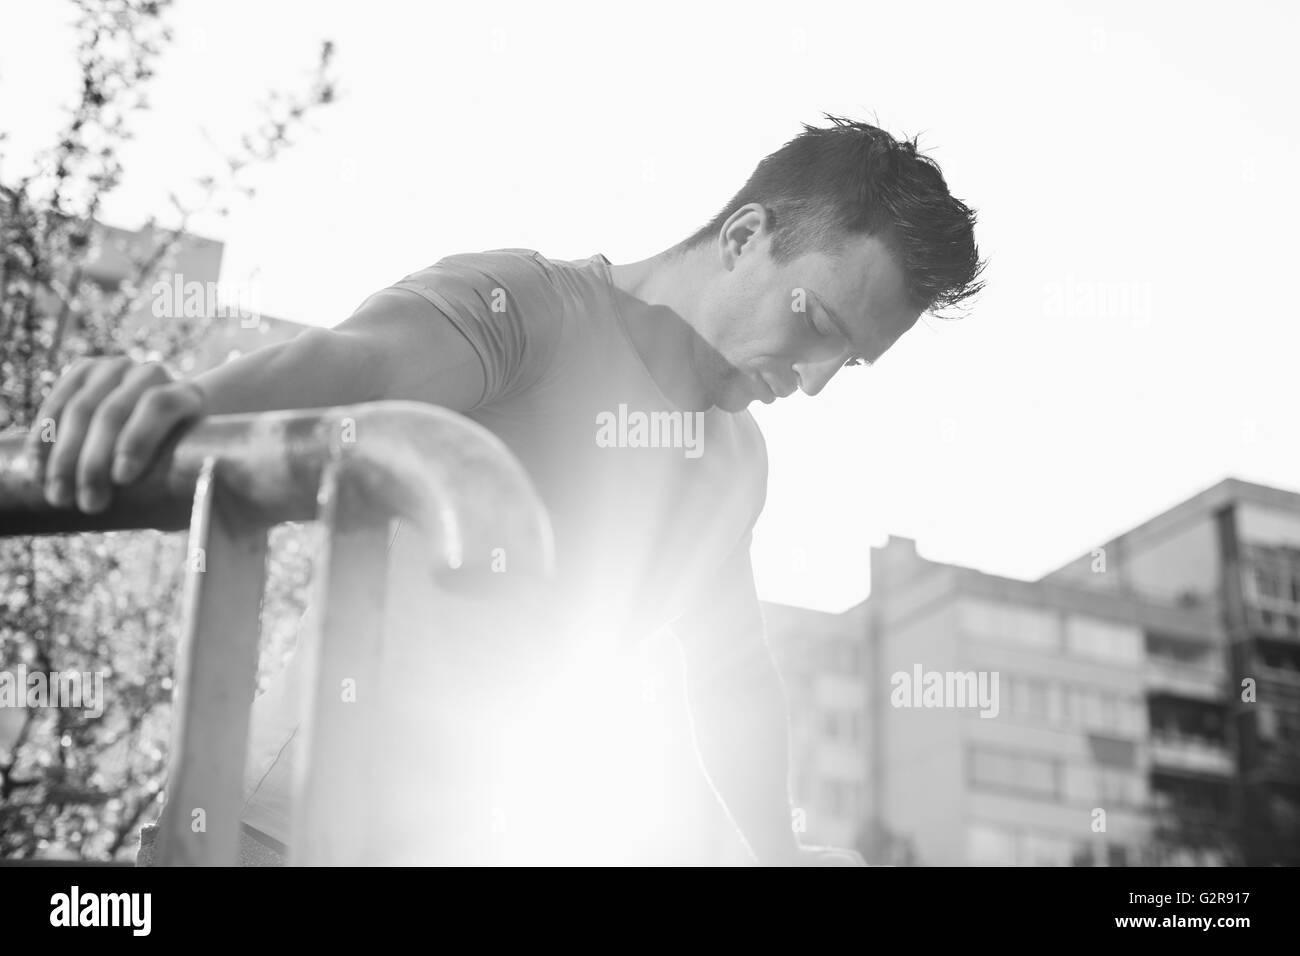 Street workout, confident sportsman - Stock Image